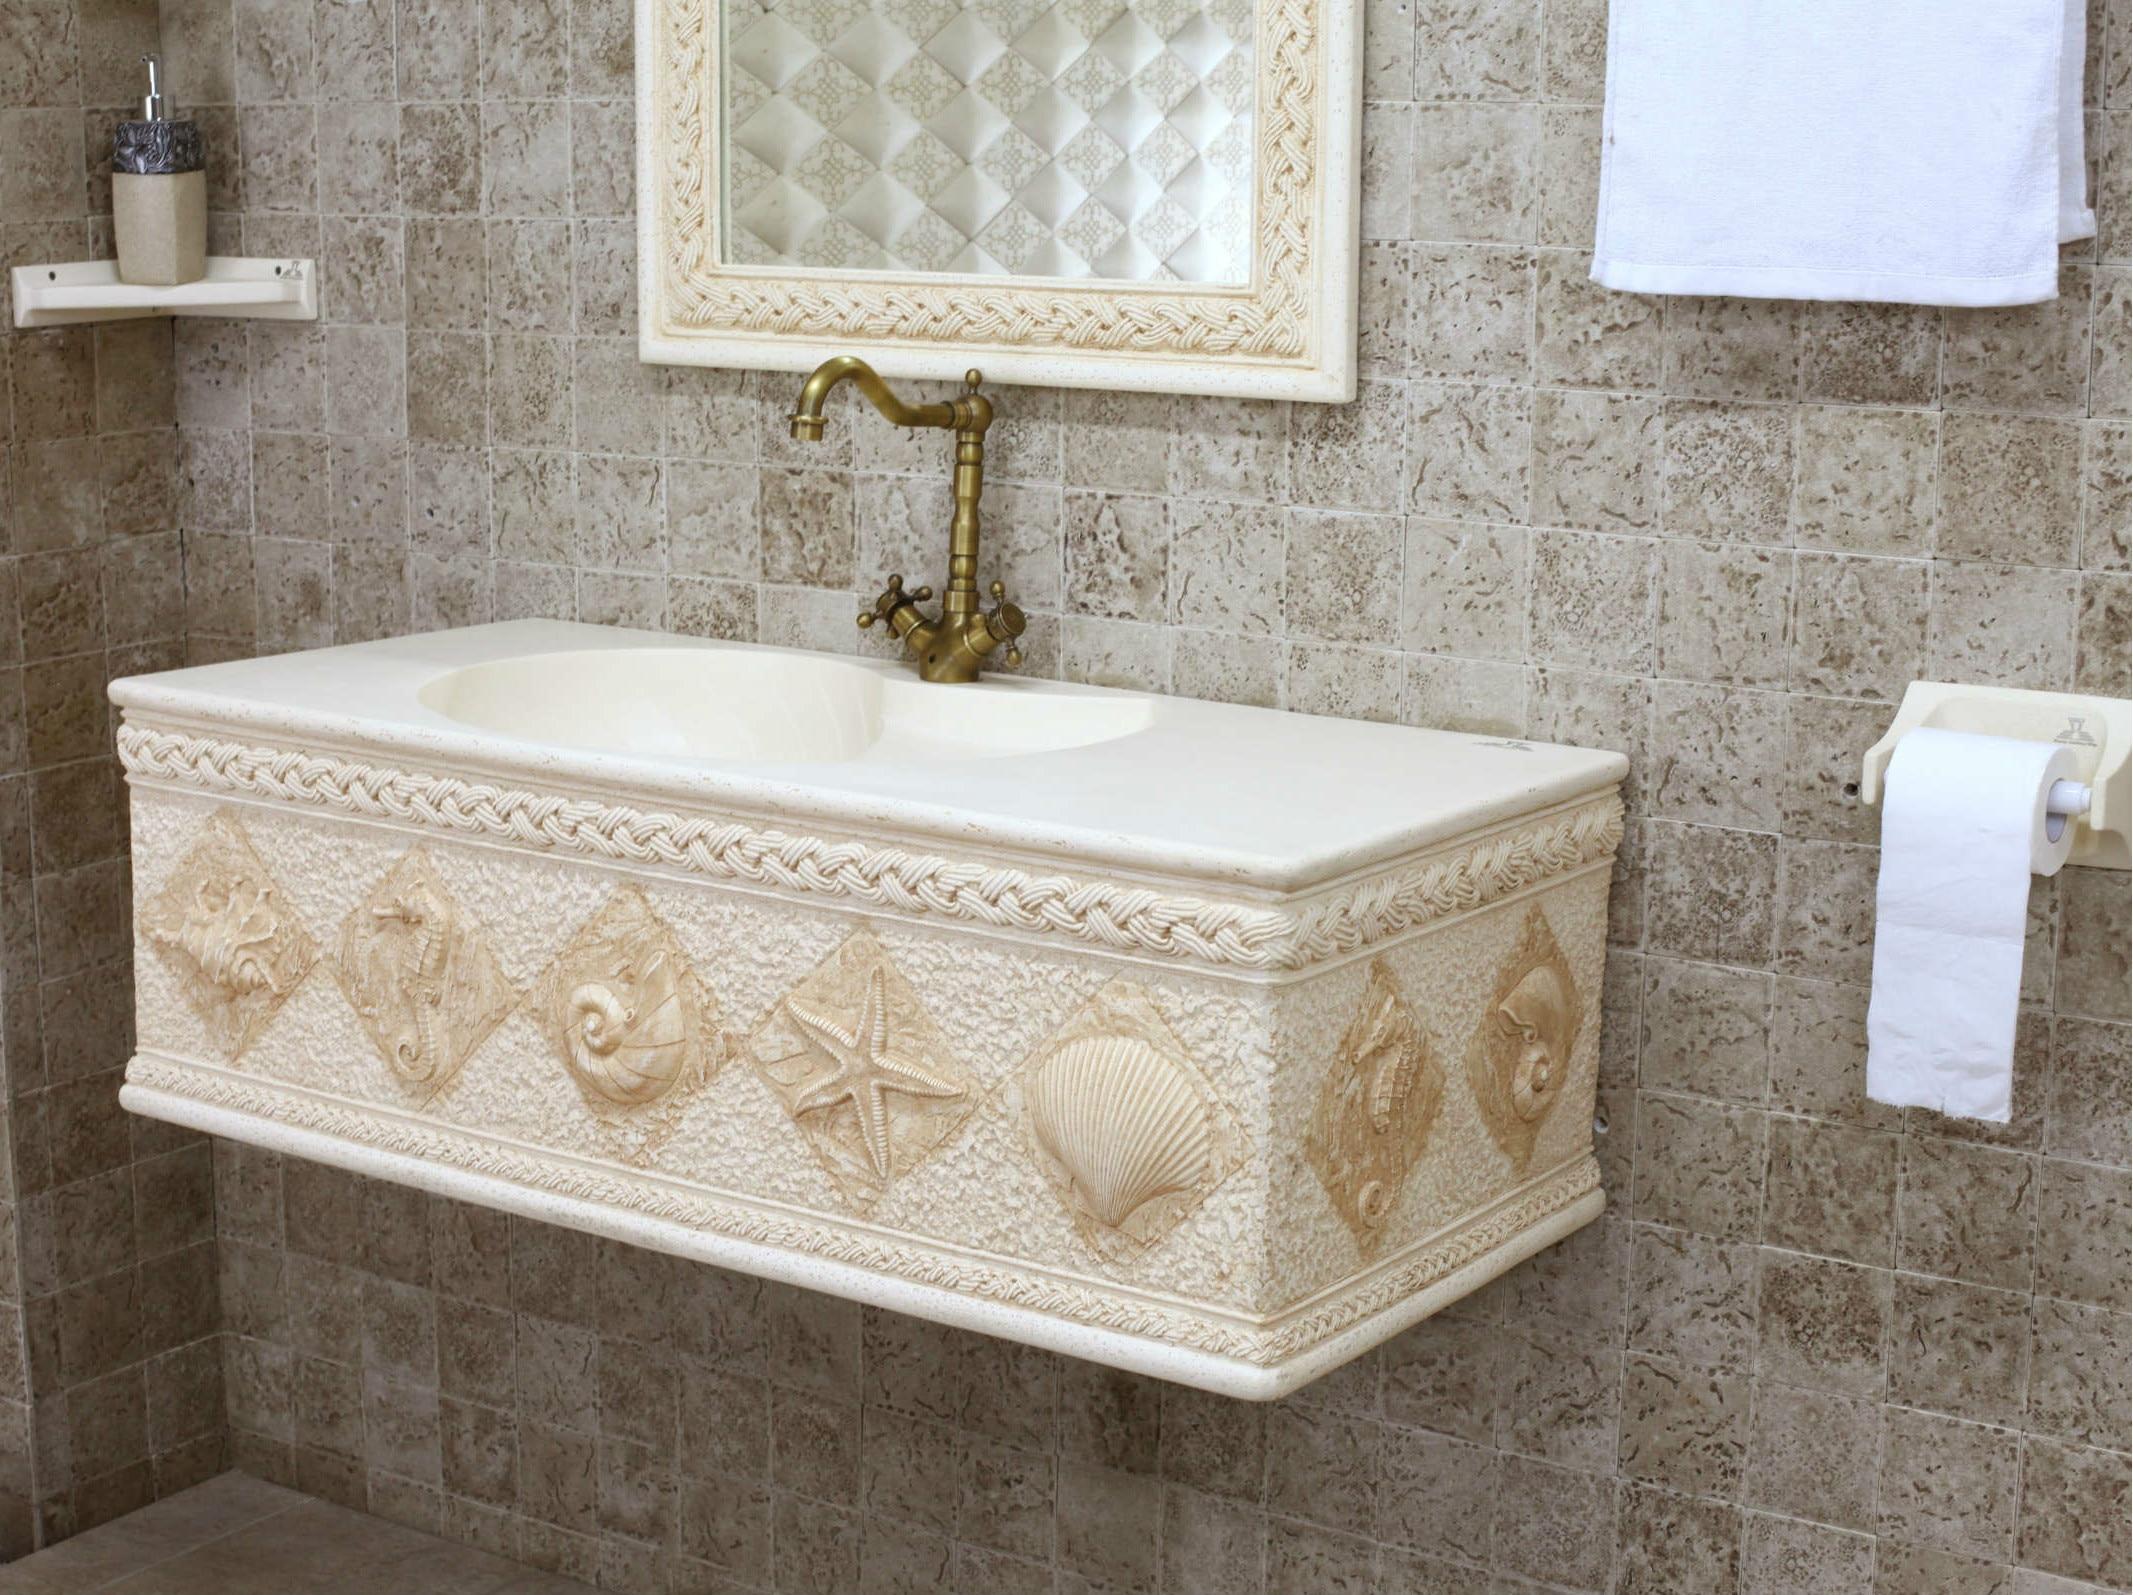 Bathroom Sinks Uk Cheap online get cheap marble bathroom basins -aliexpress | alibaba